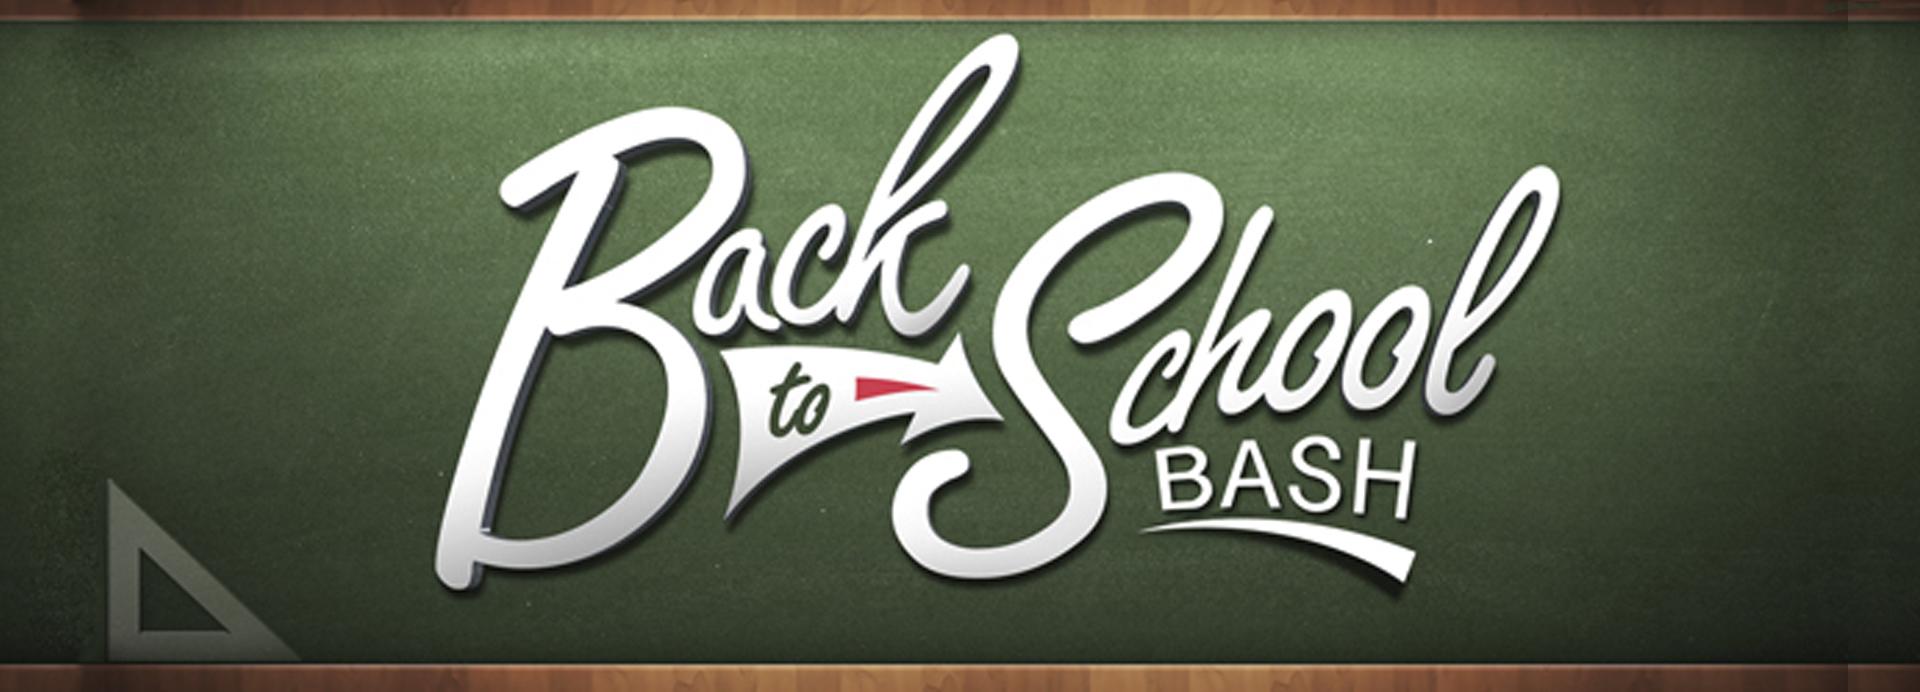 1920x692 Back to School Bash.jpg